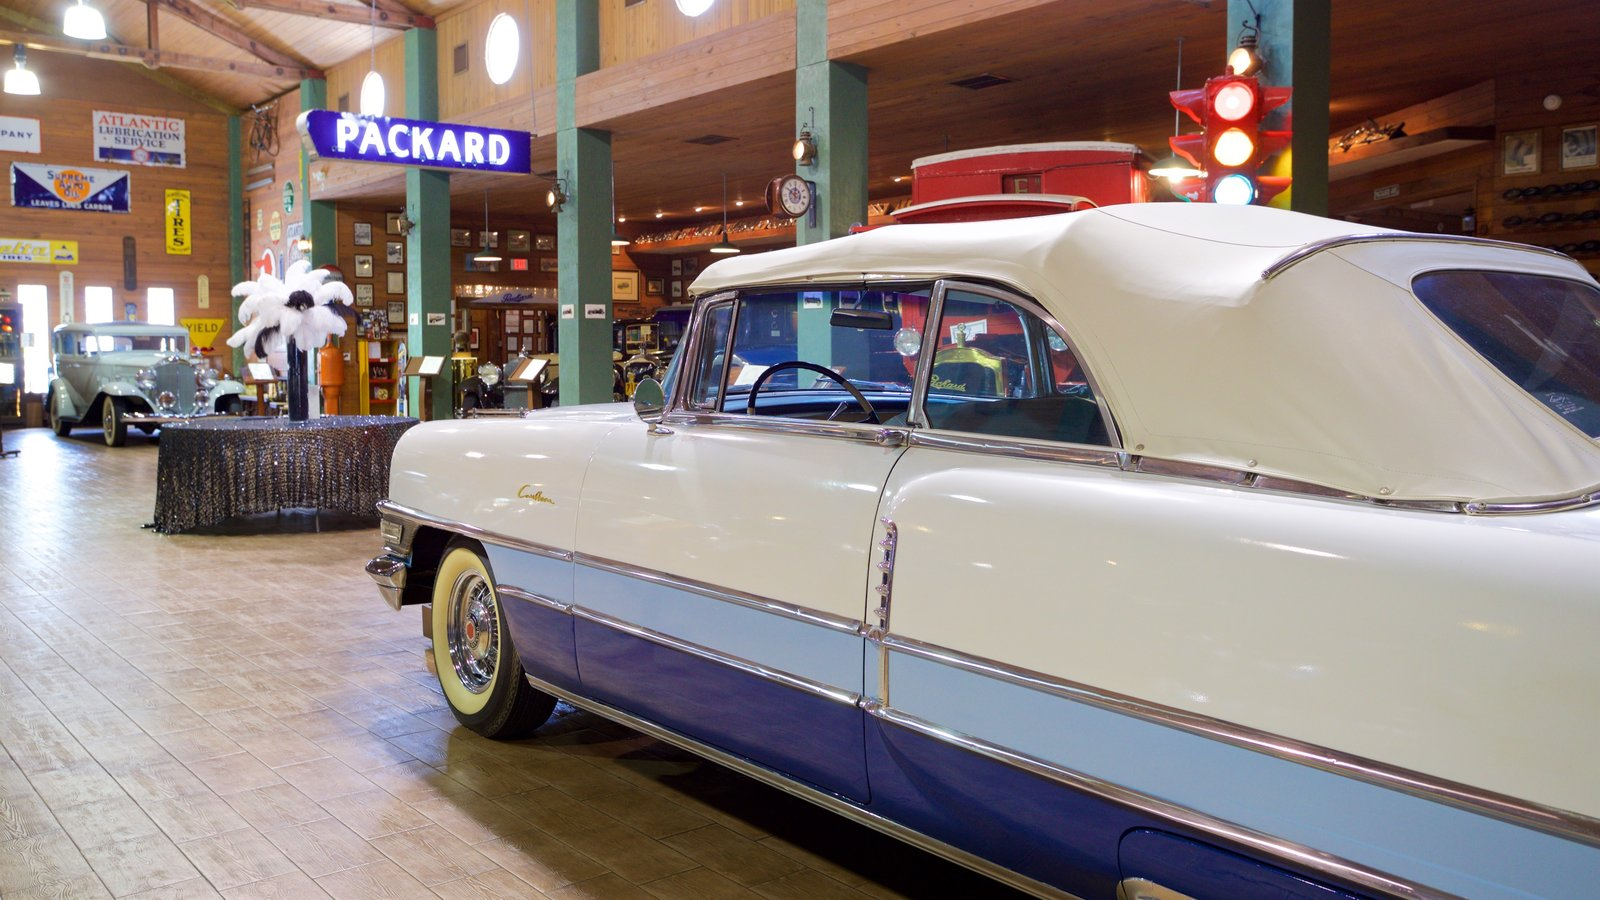 Fort Lauderdale Antique Car Museum que inclui elementos de patrimônio e vistas internas